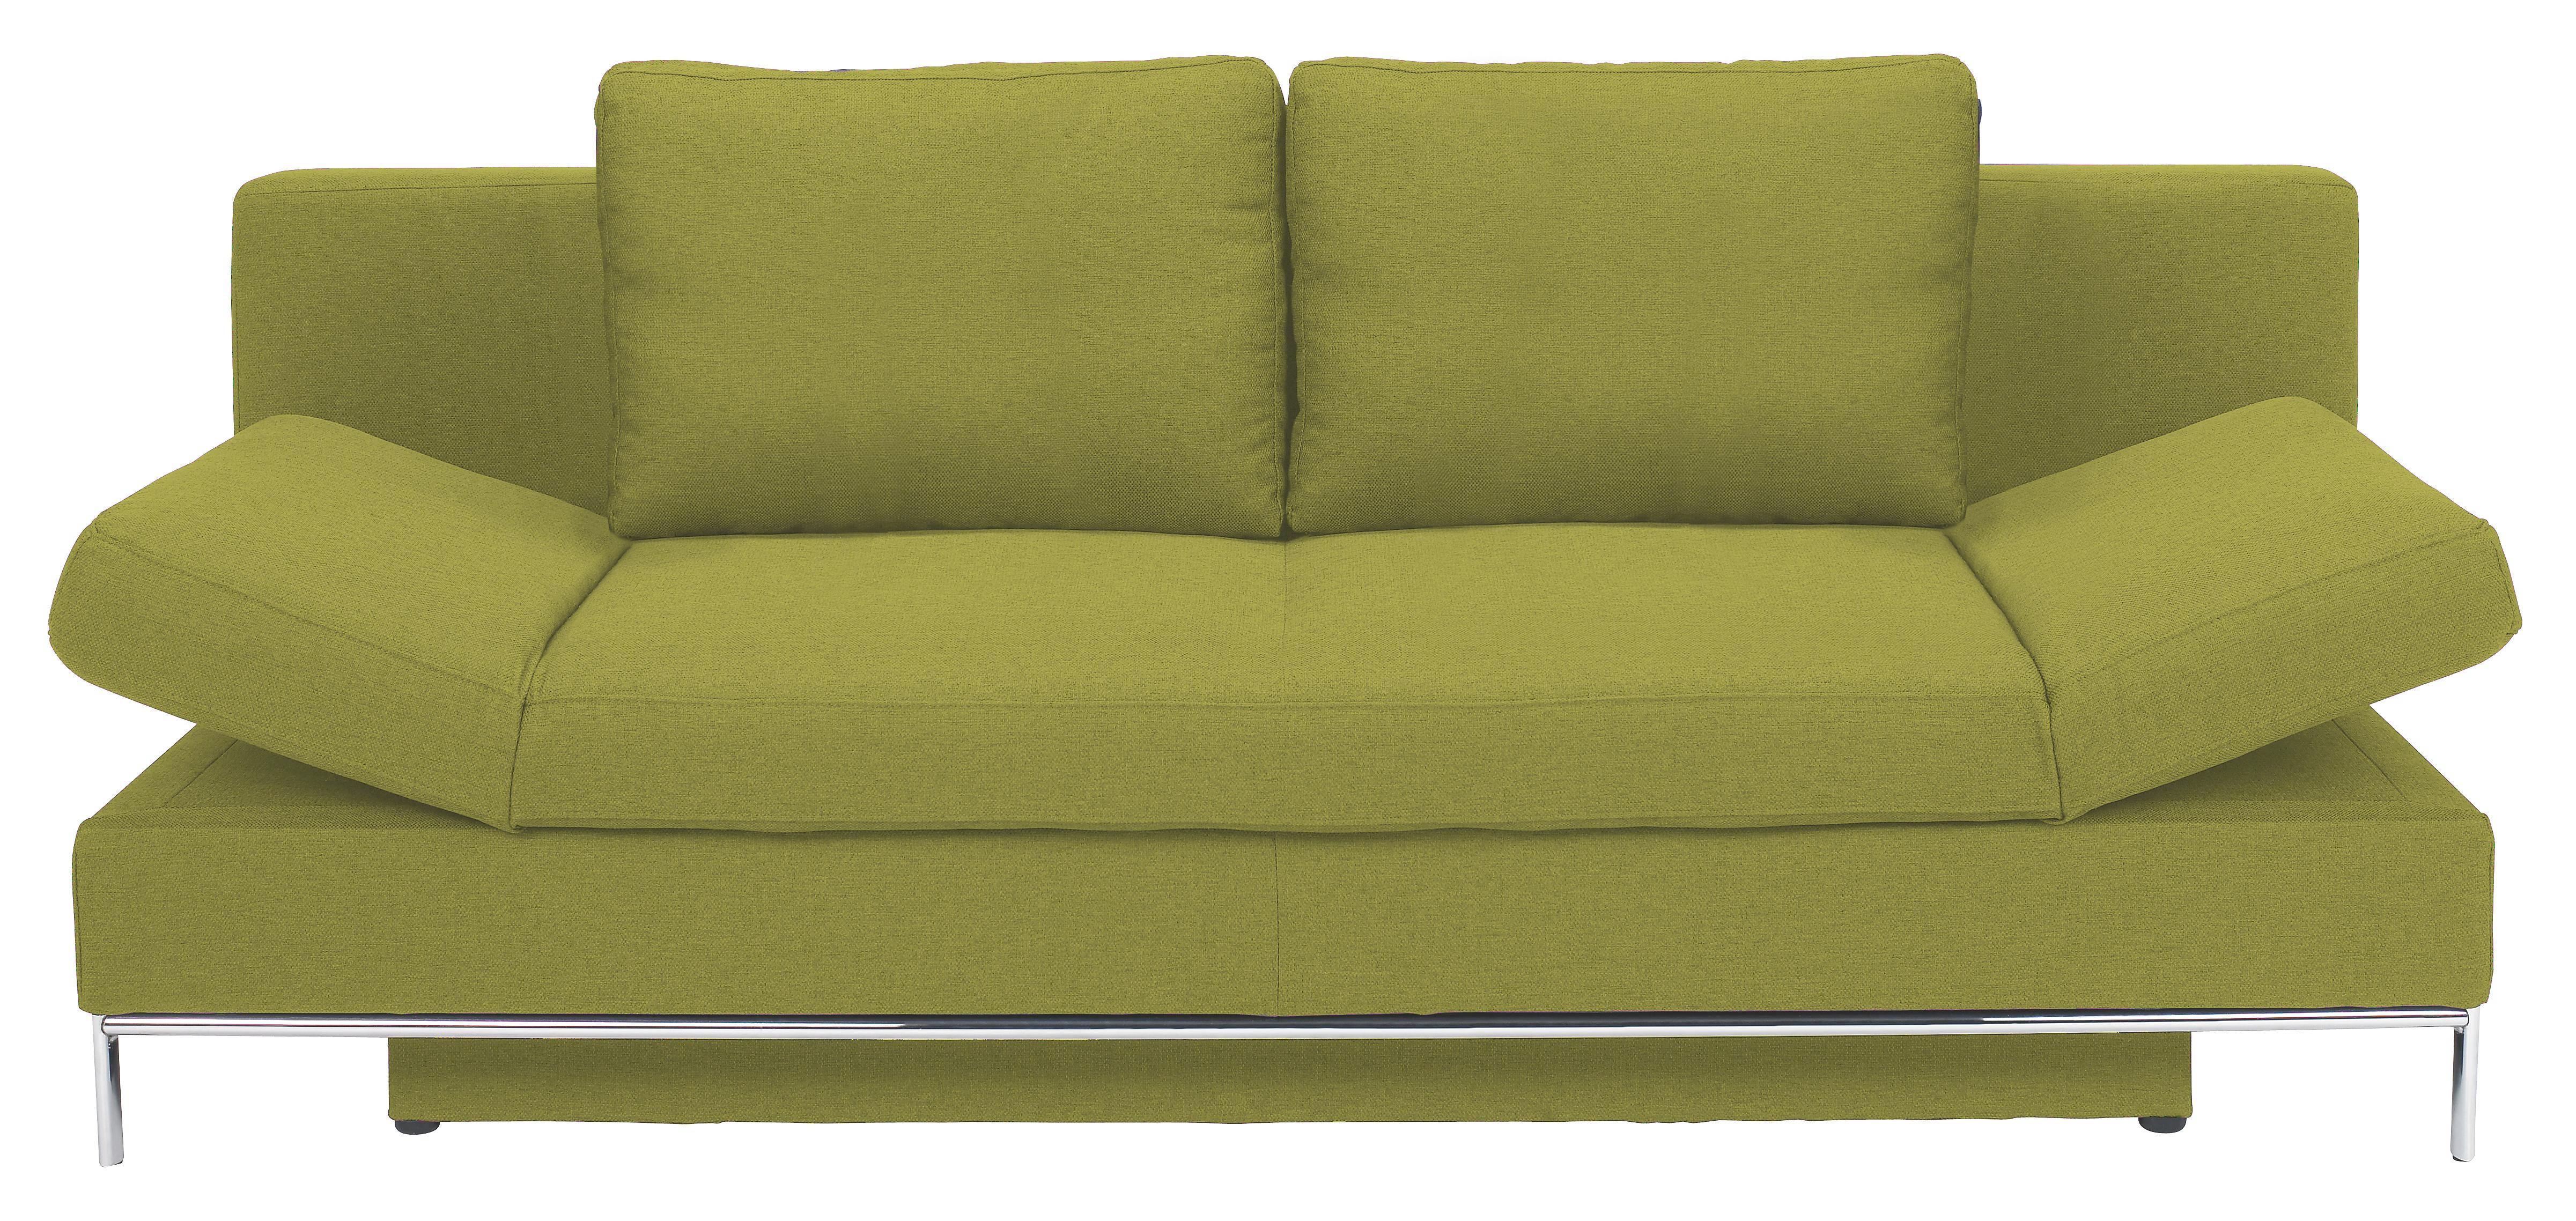 Schlafsofa grün  SCHLAFSOFA Flachgewebe Grün online kaufen ➤ XXXLShop